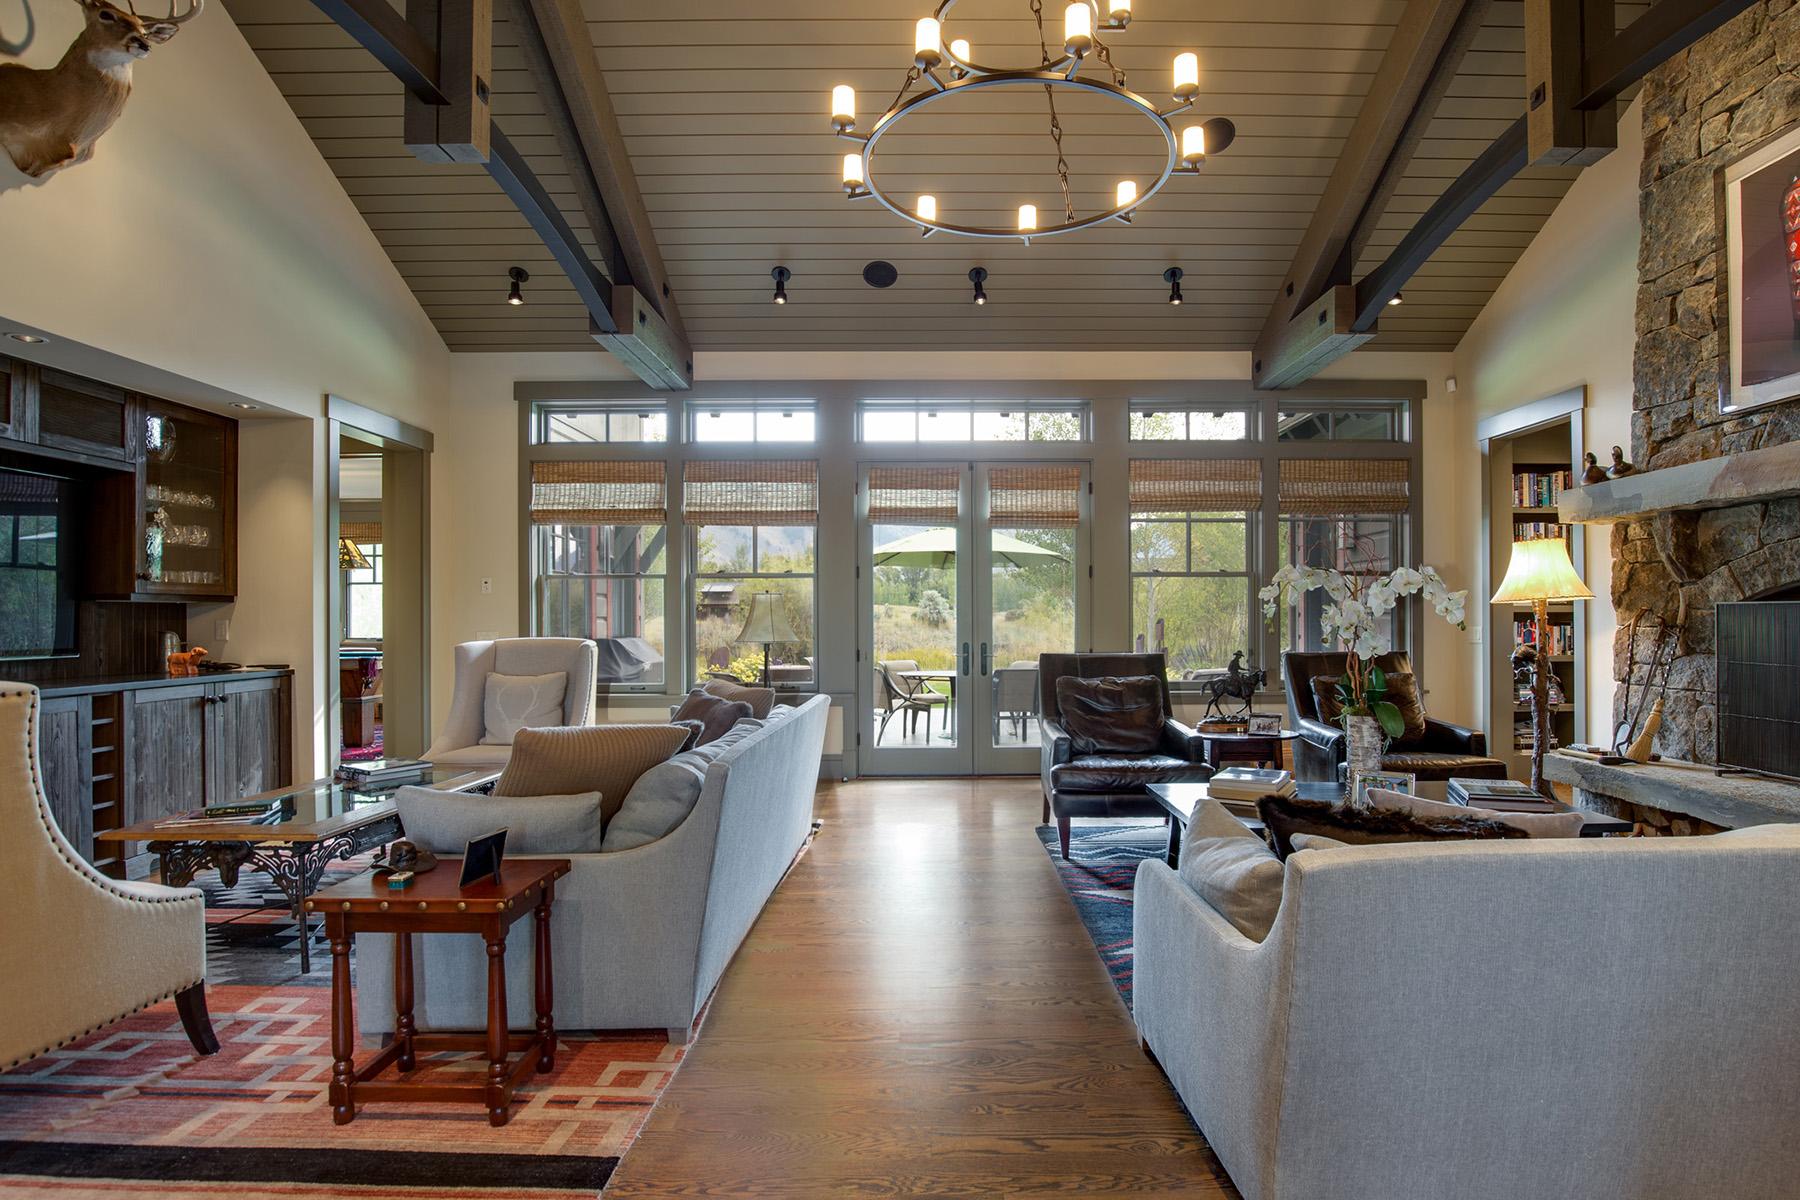 Single Family Homes pour l Vente à Contemporary 3 Creek Cabin With 2 Lots 2730 W Otter Ln & 2735 Silver Fox Ln, Jackson, Wyoming 83001 États-Unis